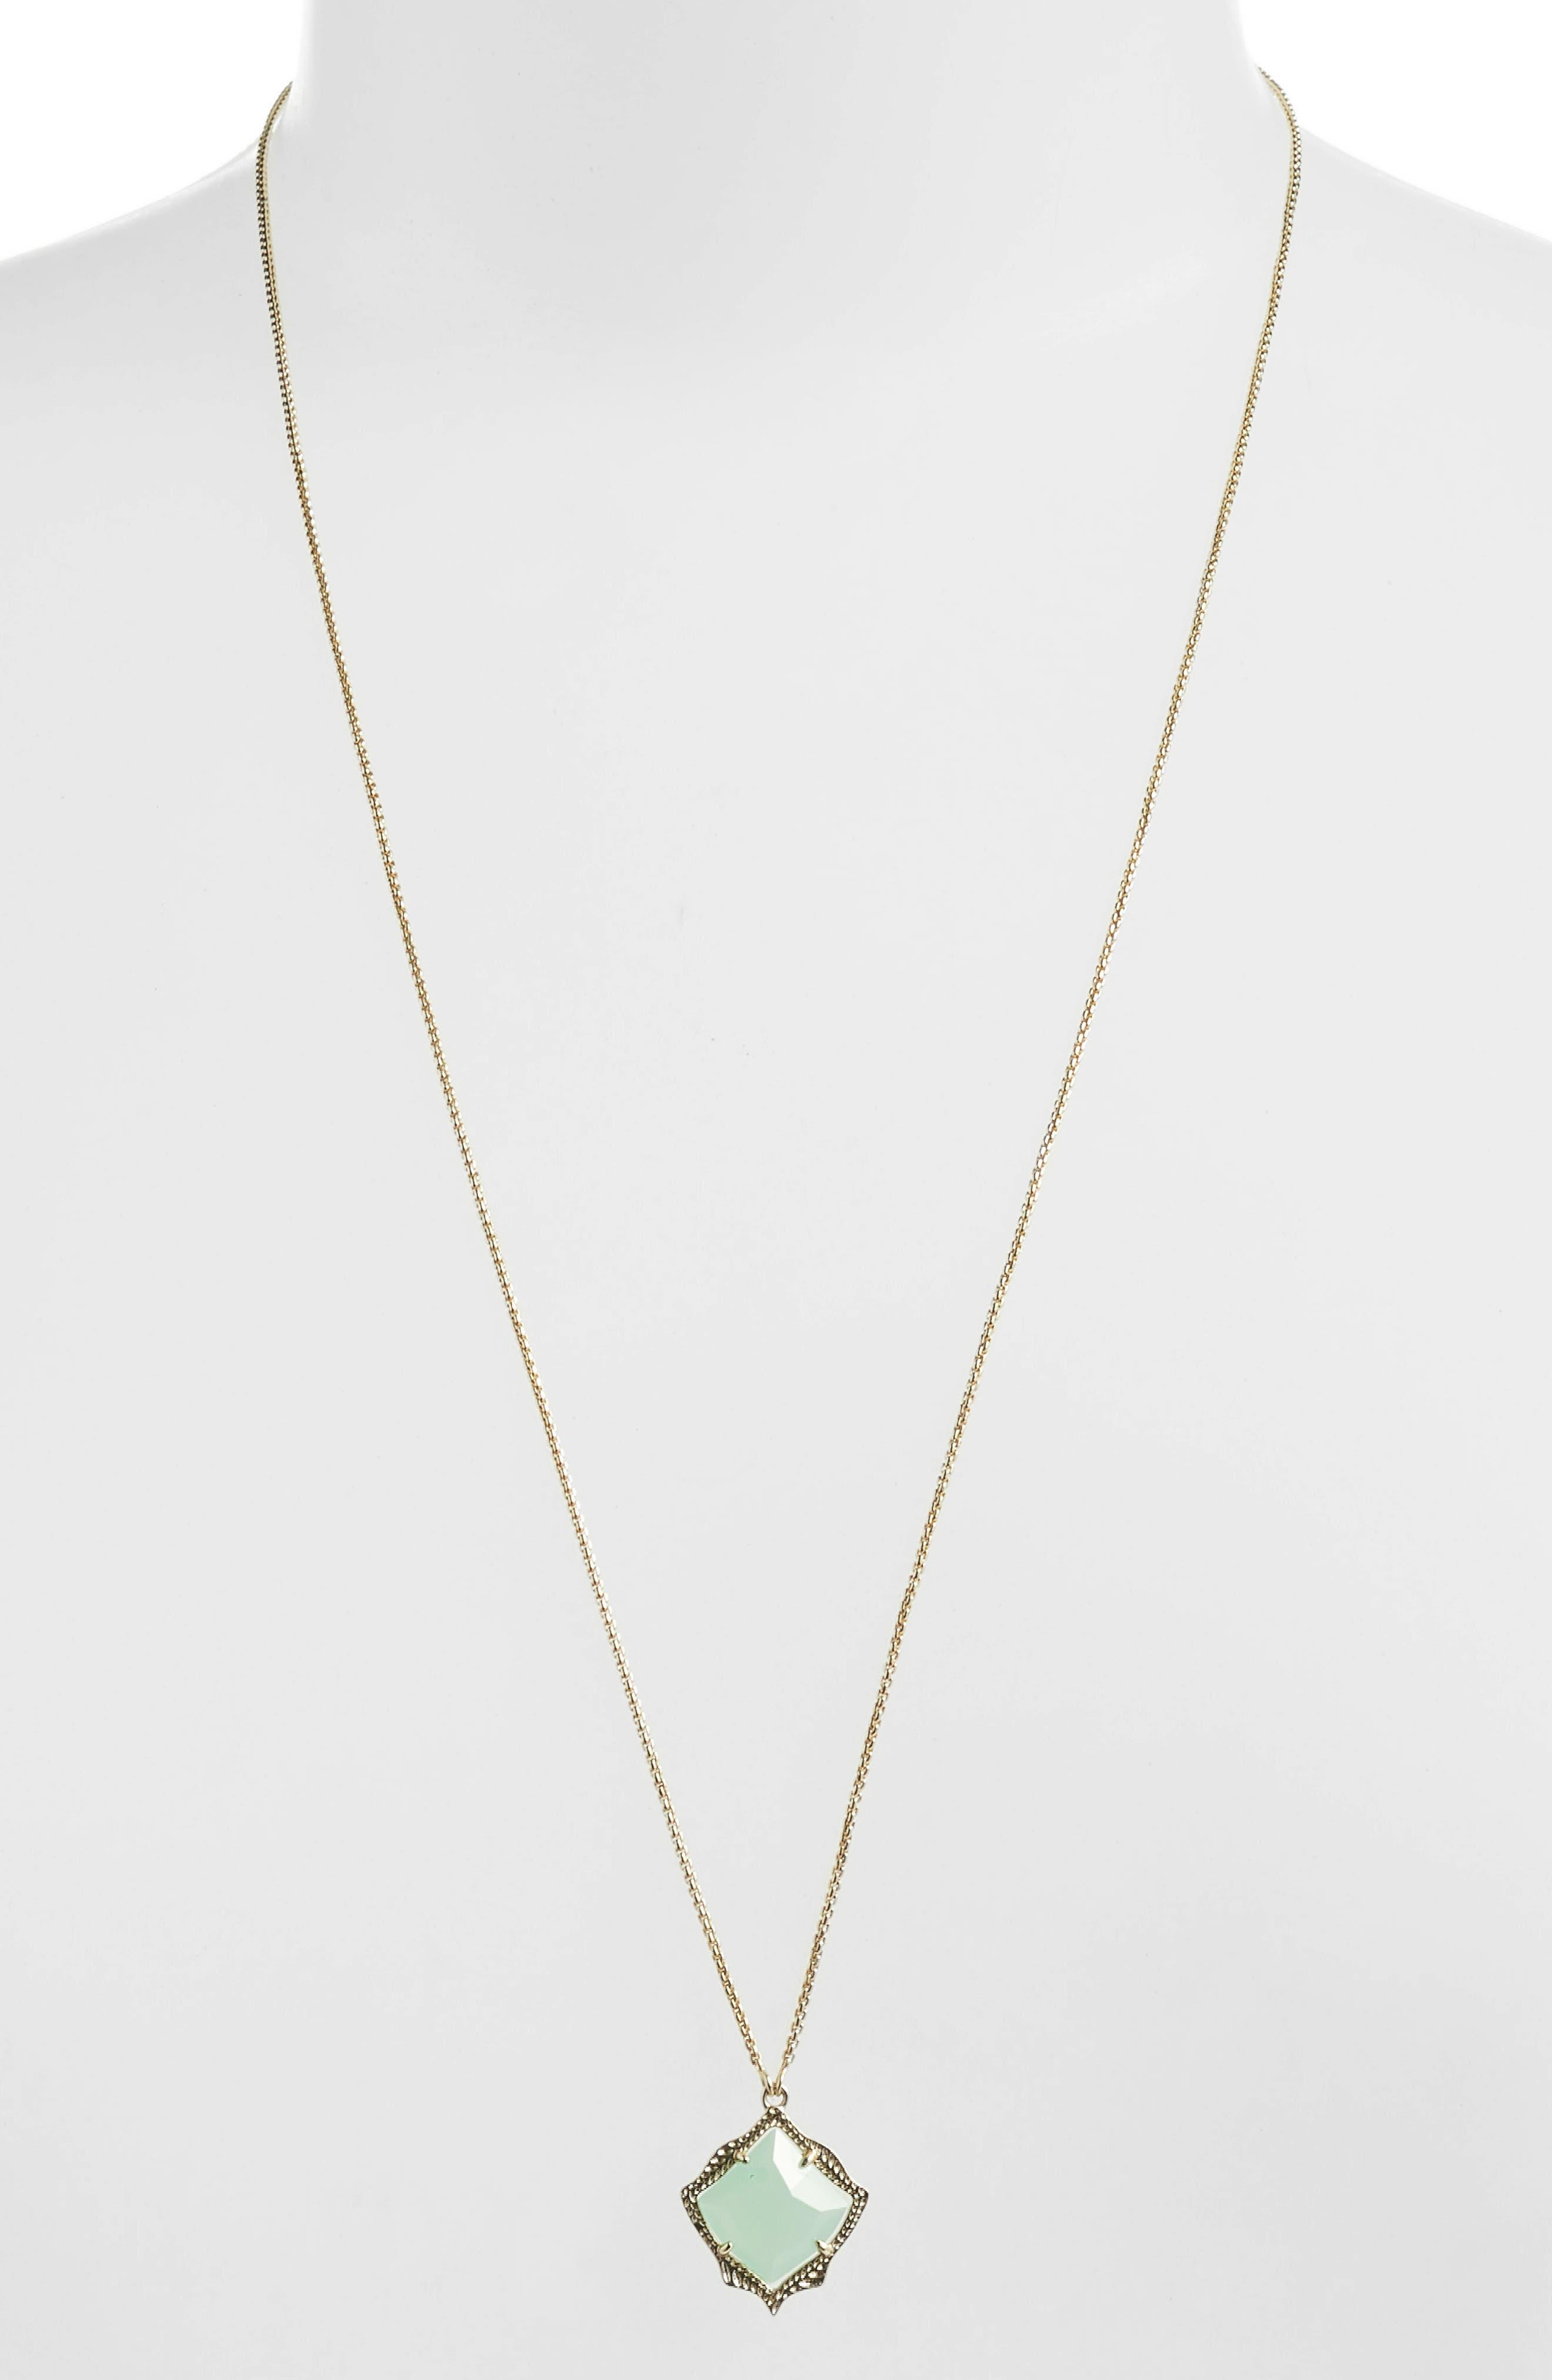 Main Image - Kendra Scott Kacey Pendant Necklace